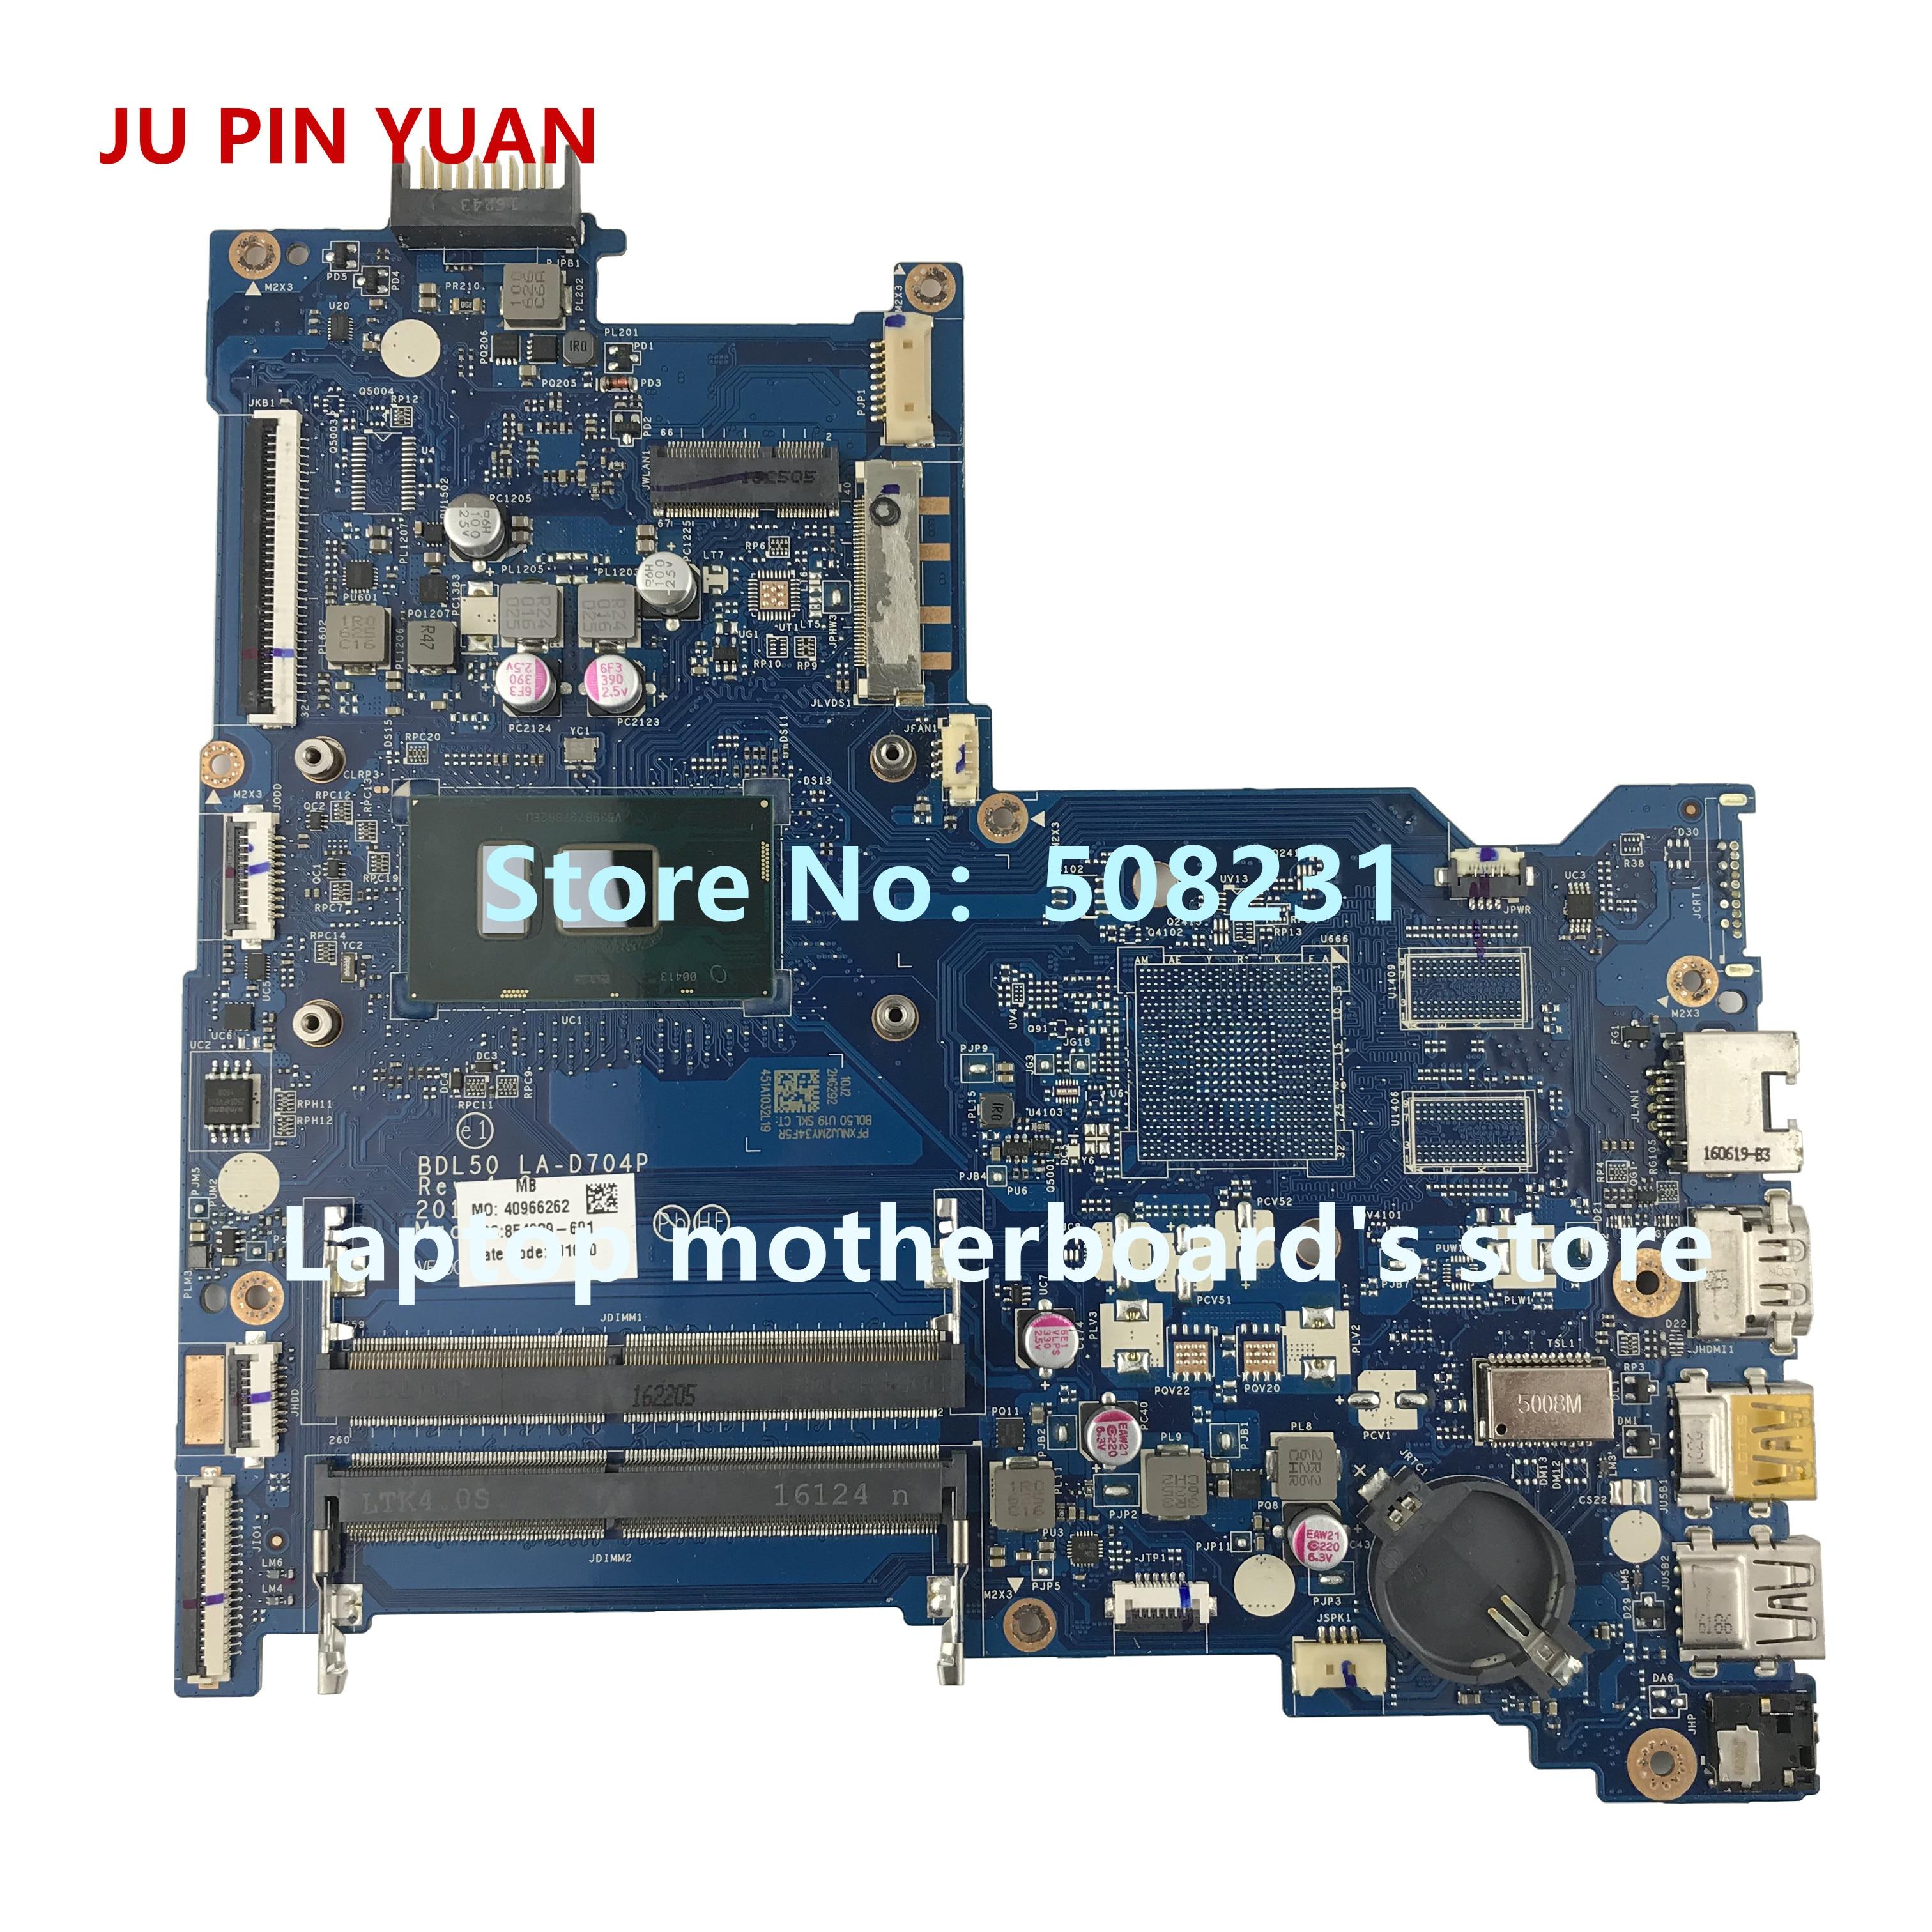 Ju pin yuan 854939-601 854939-501 BDL50 LA-D704P материнская плата для ноутбука HP 15-AY материнская плата i3-6100U полностью протестирована